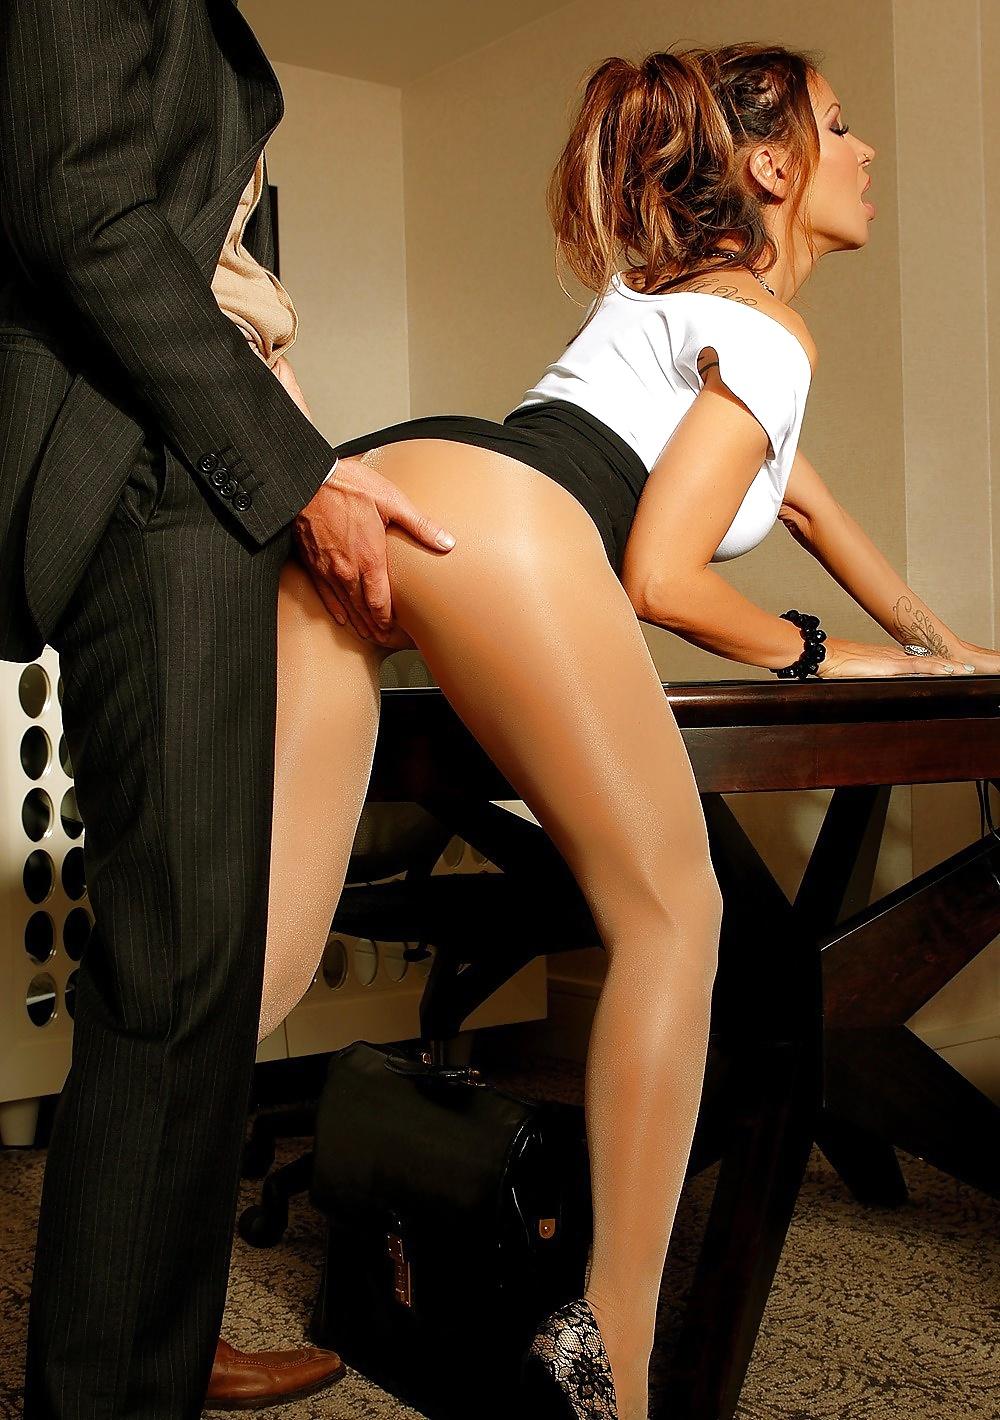 секретарша подняла юбку для секса - 8